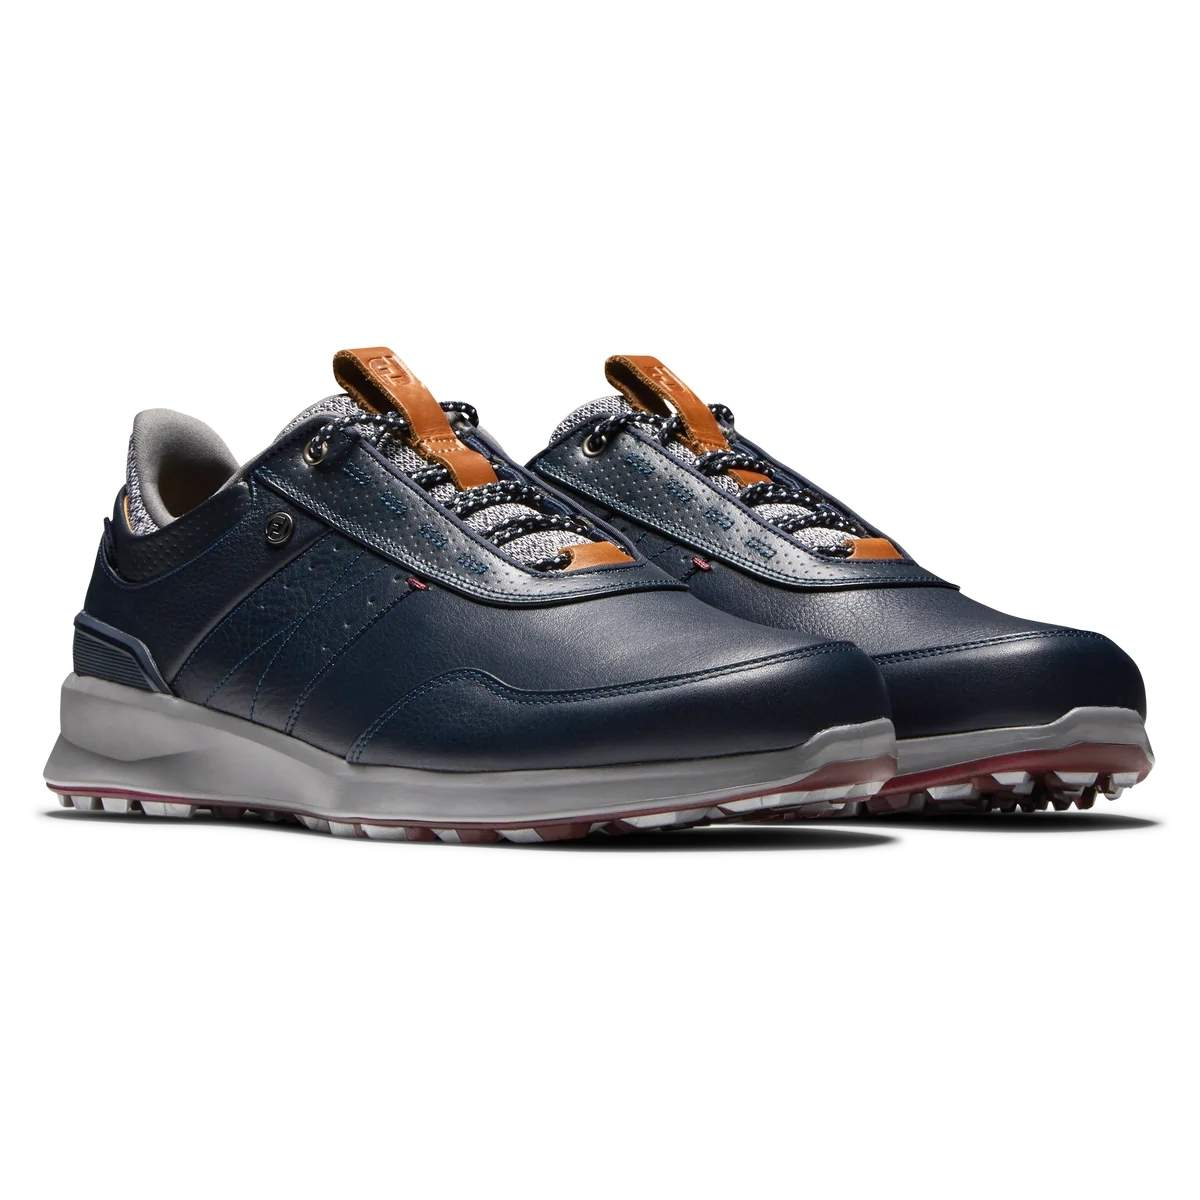 FootJoy Men's Stratos Golf Shoe - Navy 50043